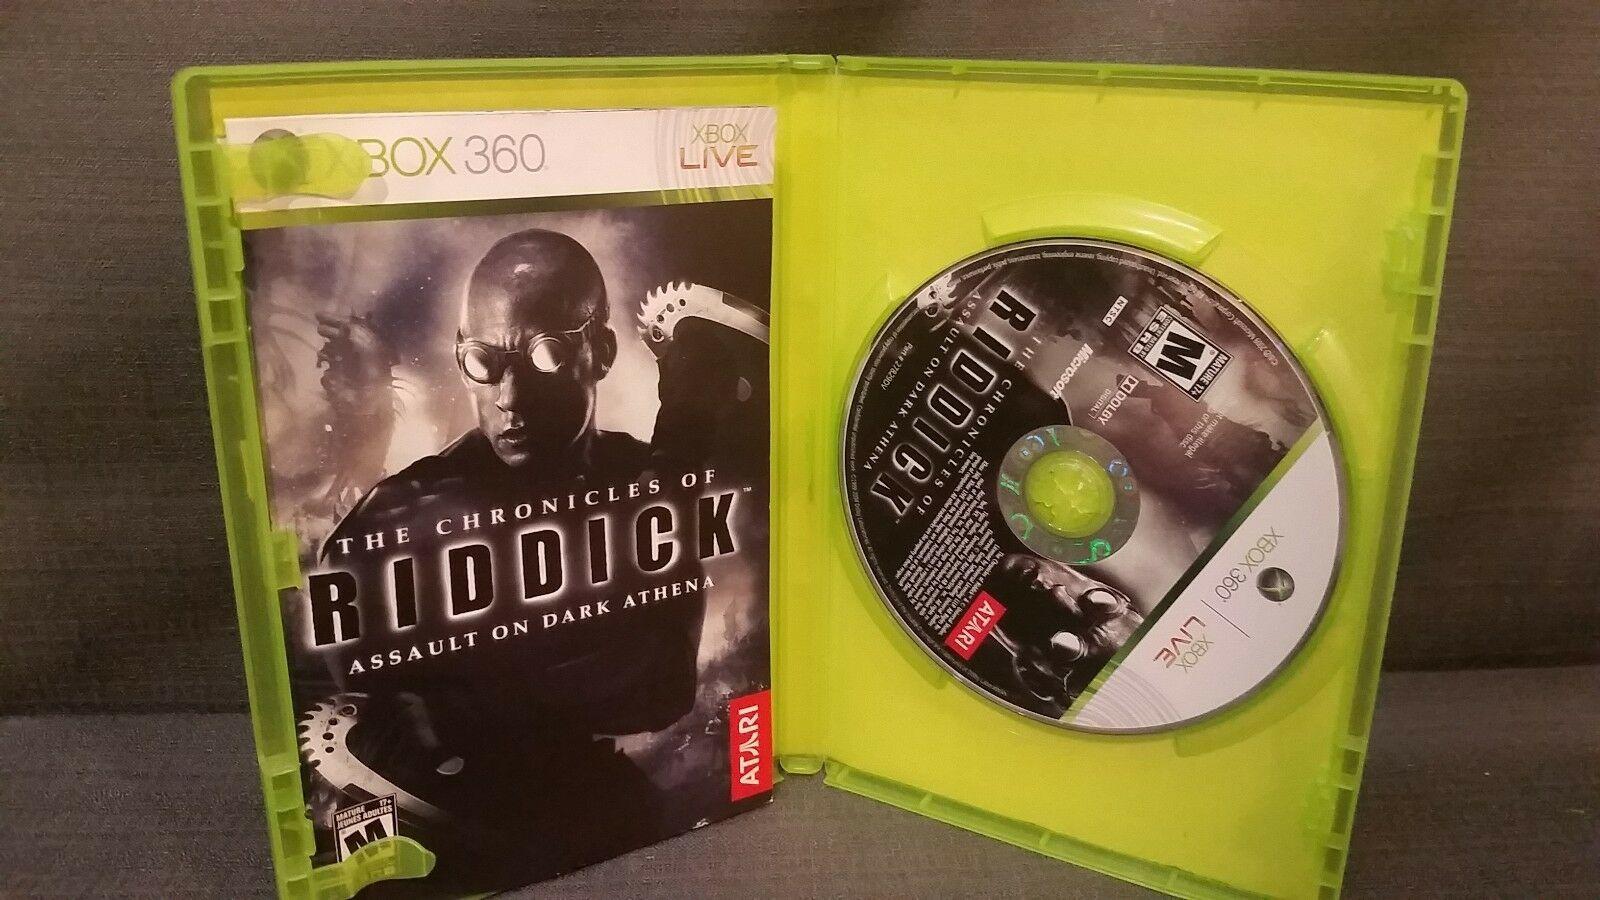 Chronicles of Riddick: Assault on Dark Athena (Microsoft Xbox 360, 2009)